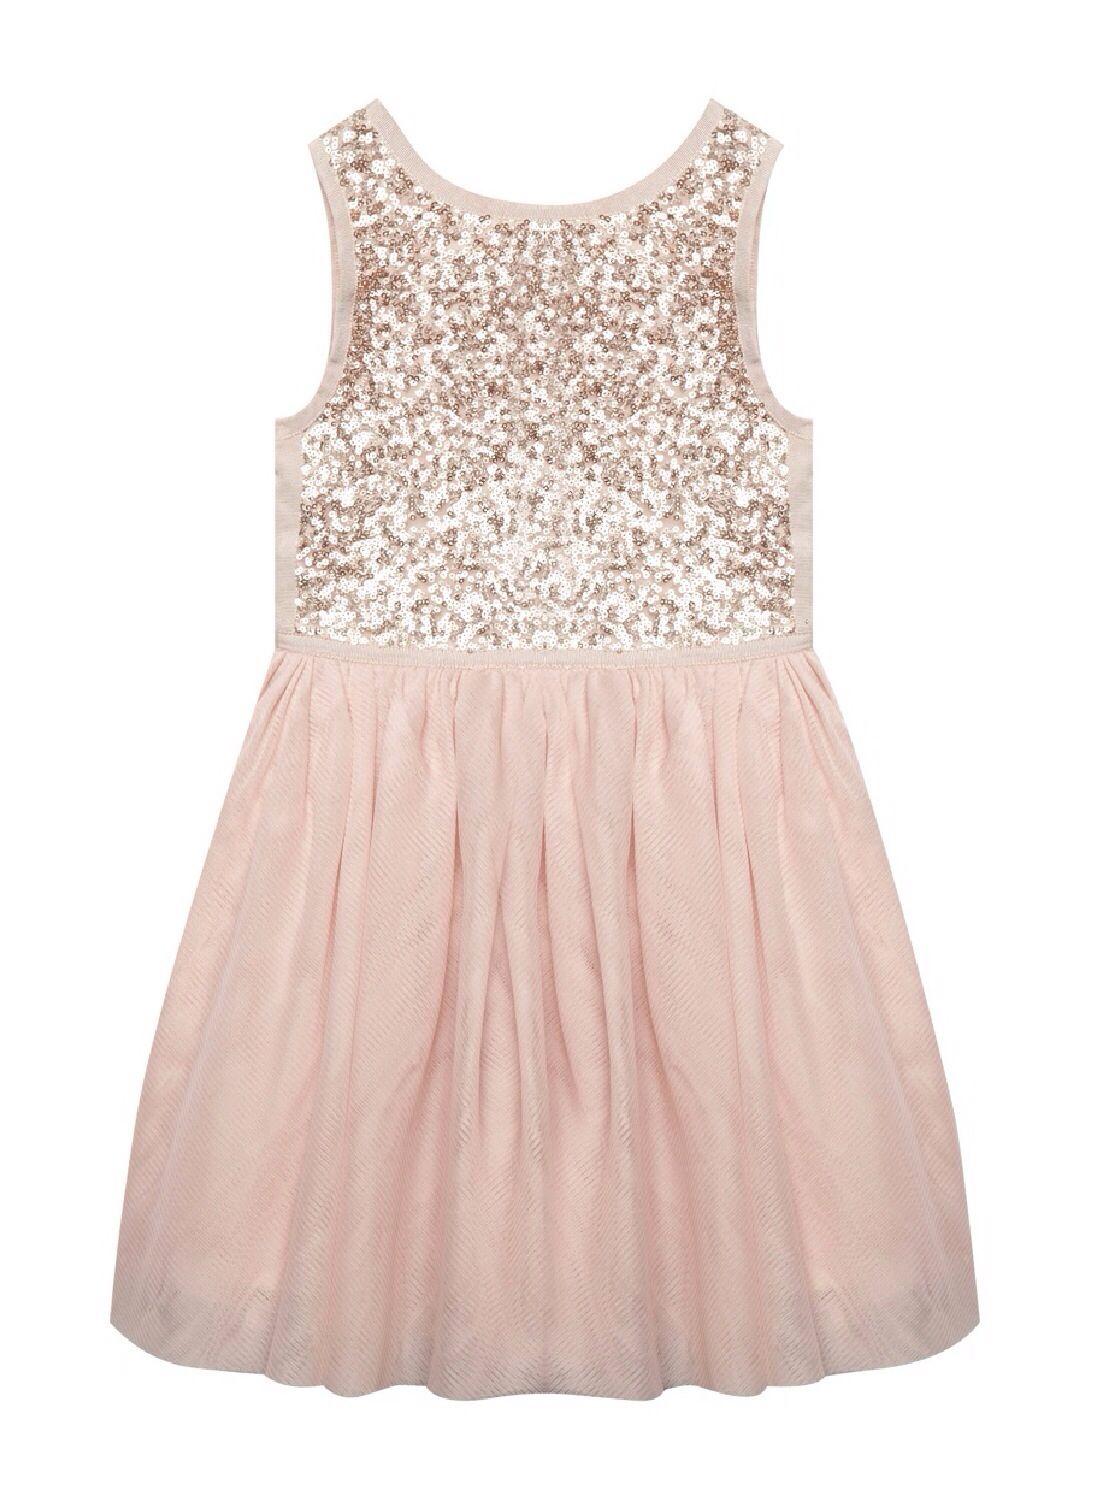 Pink Gold Flower Girl Or Bridesmaid Dress Baker By Ted Baker I